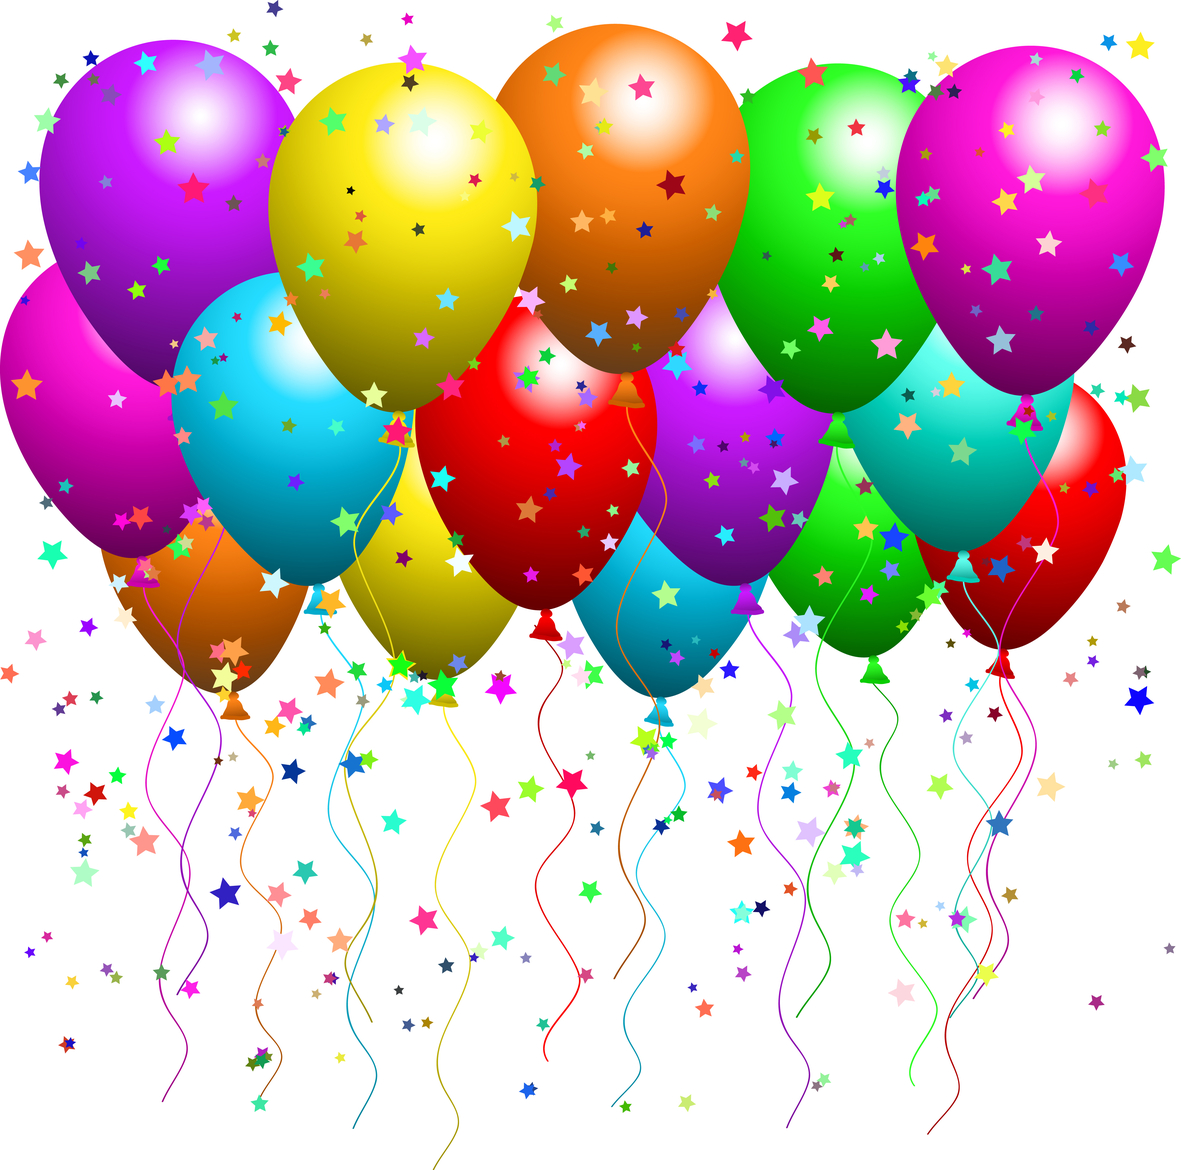 Balloon clipart party balloon. Illustration of a bunch